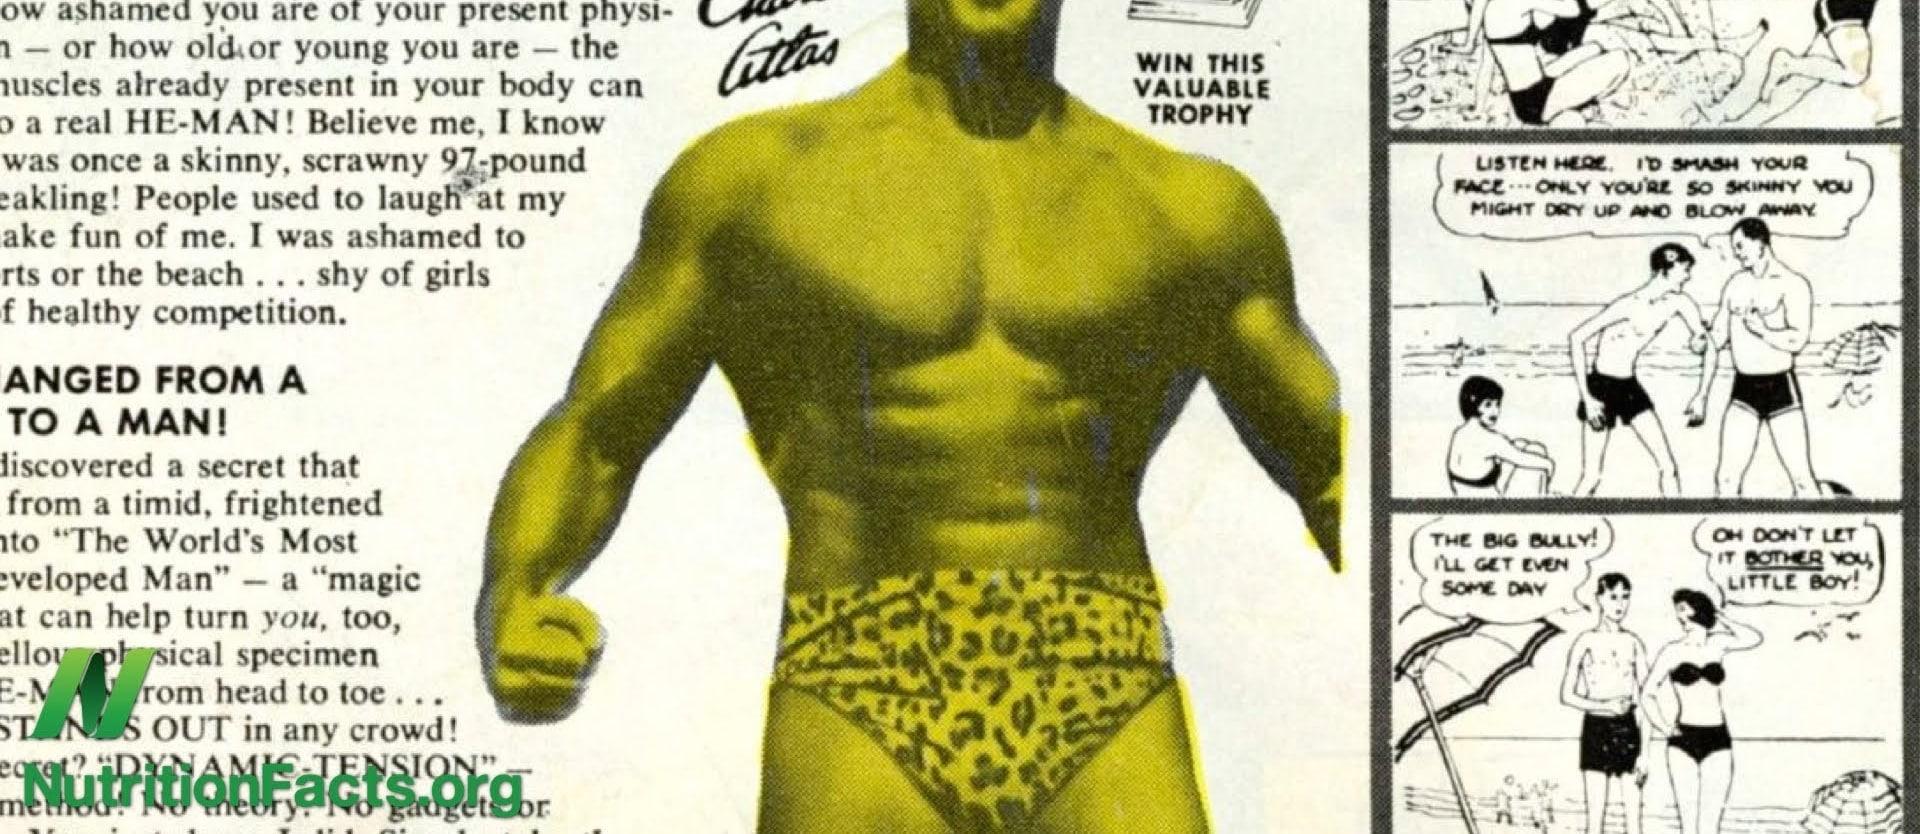 Plant-based Bodybuilding